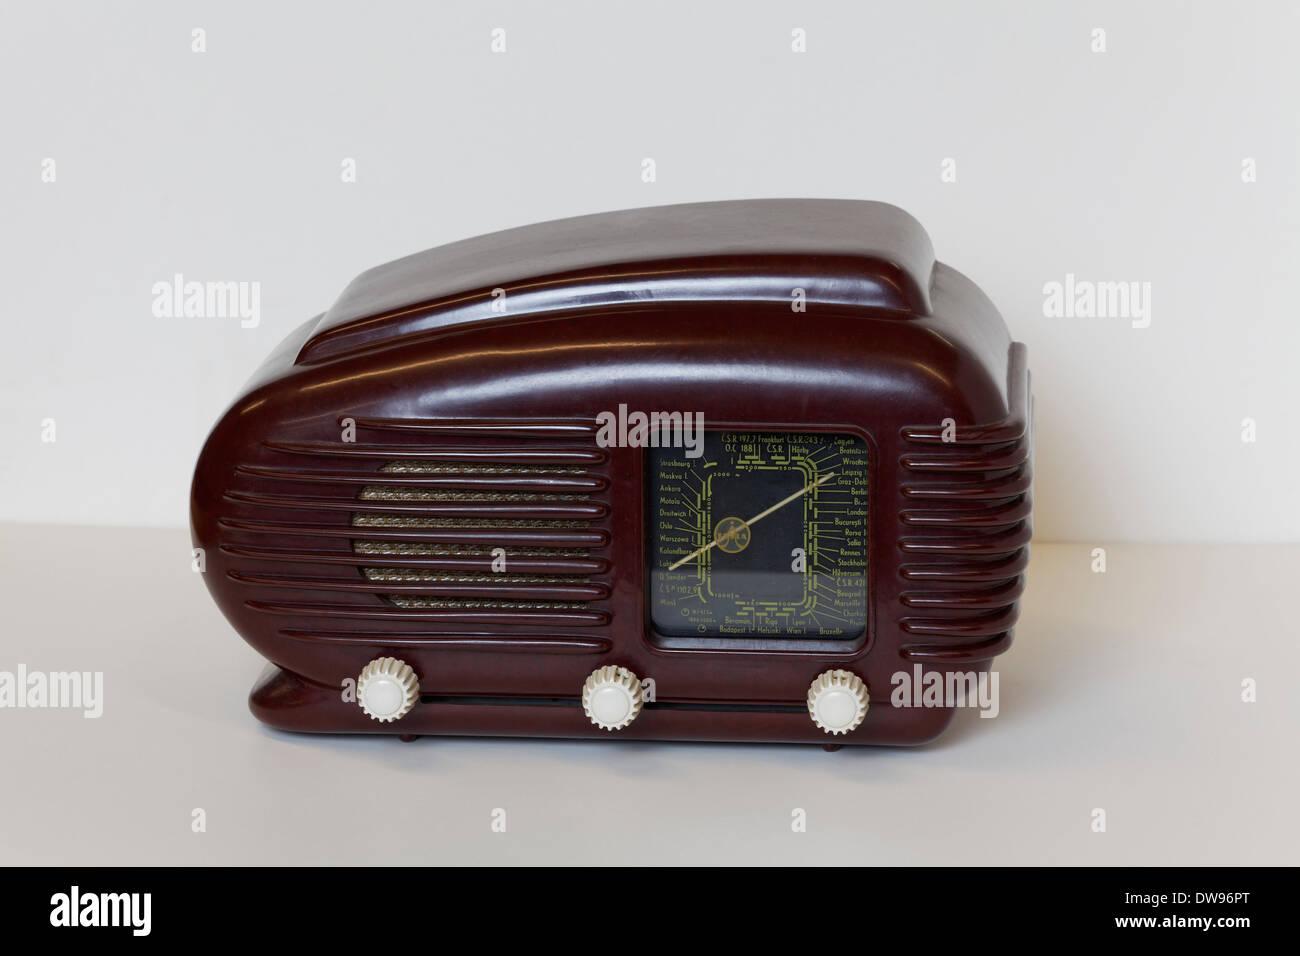 Tesla, model Talisman 308 U, Czech radio from 1948, Art Deco Bakelite housing, Radio Museum Duisburg, North Rhine-Westphalia - Stock Image